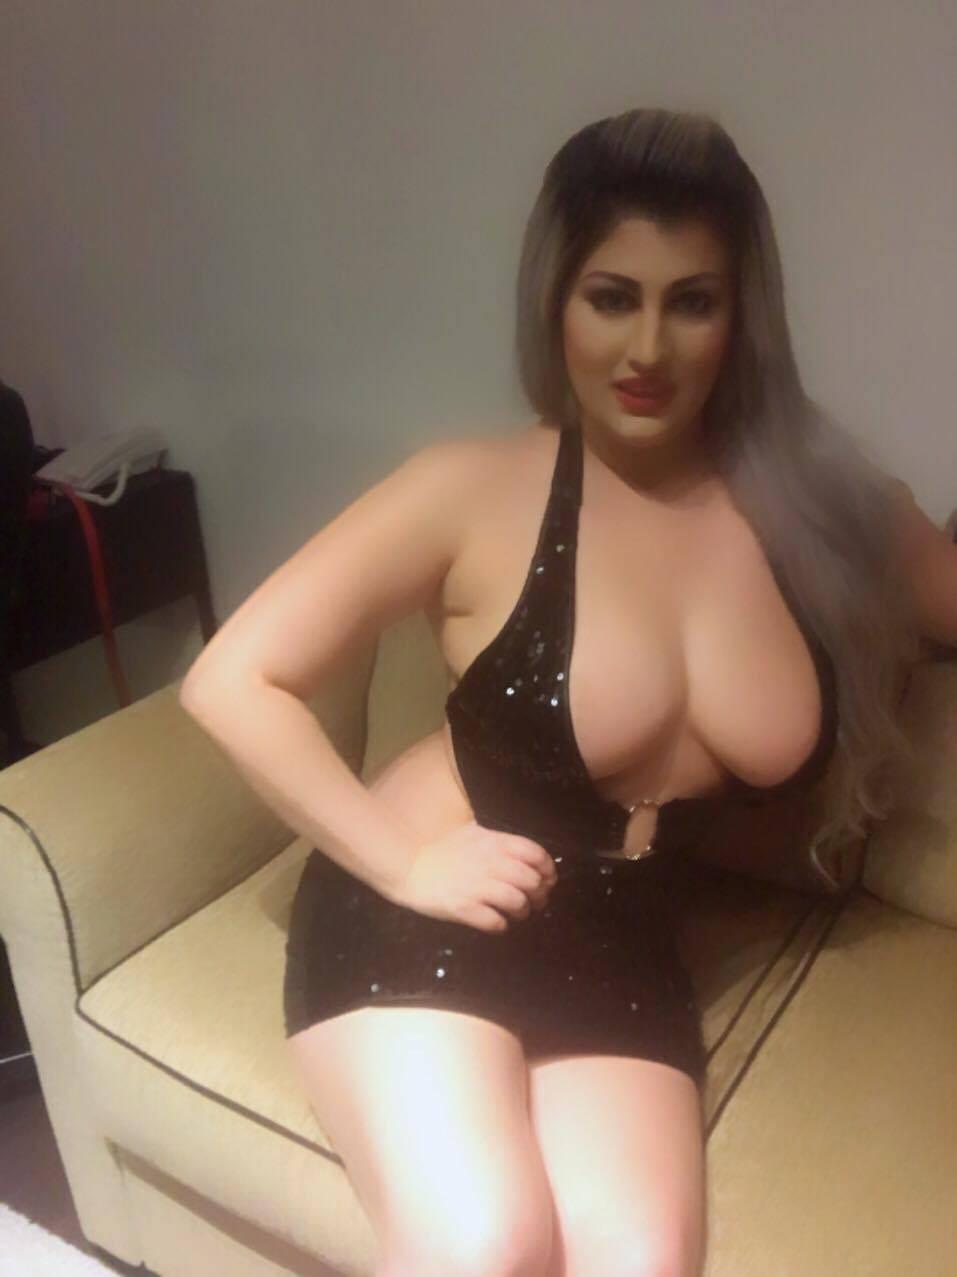 italian escorts girls for escort